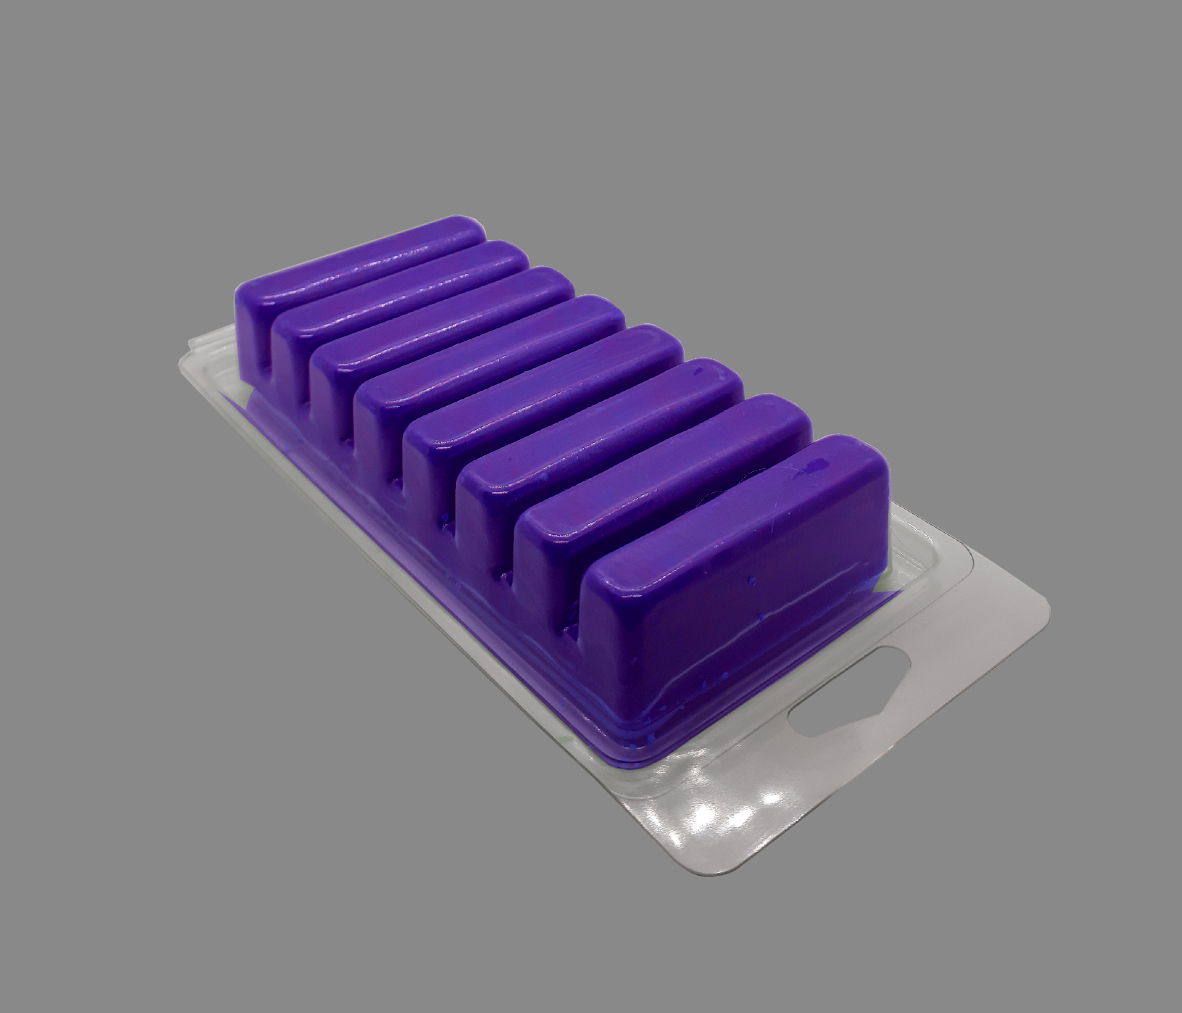 8 Cavity Snapbar Clamshells